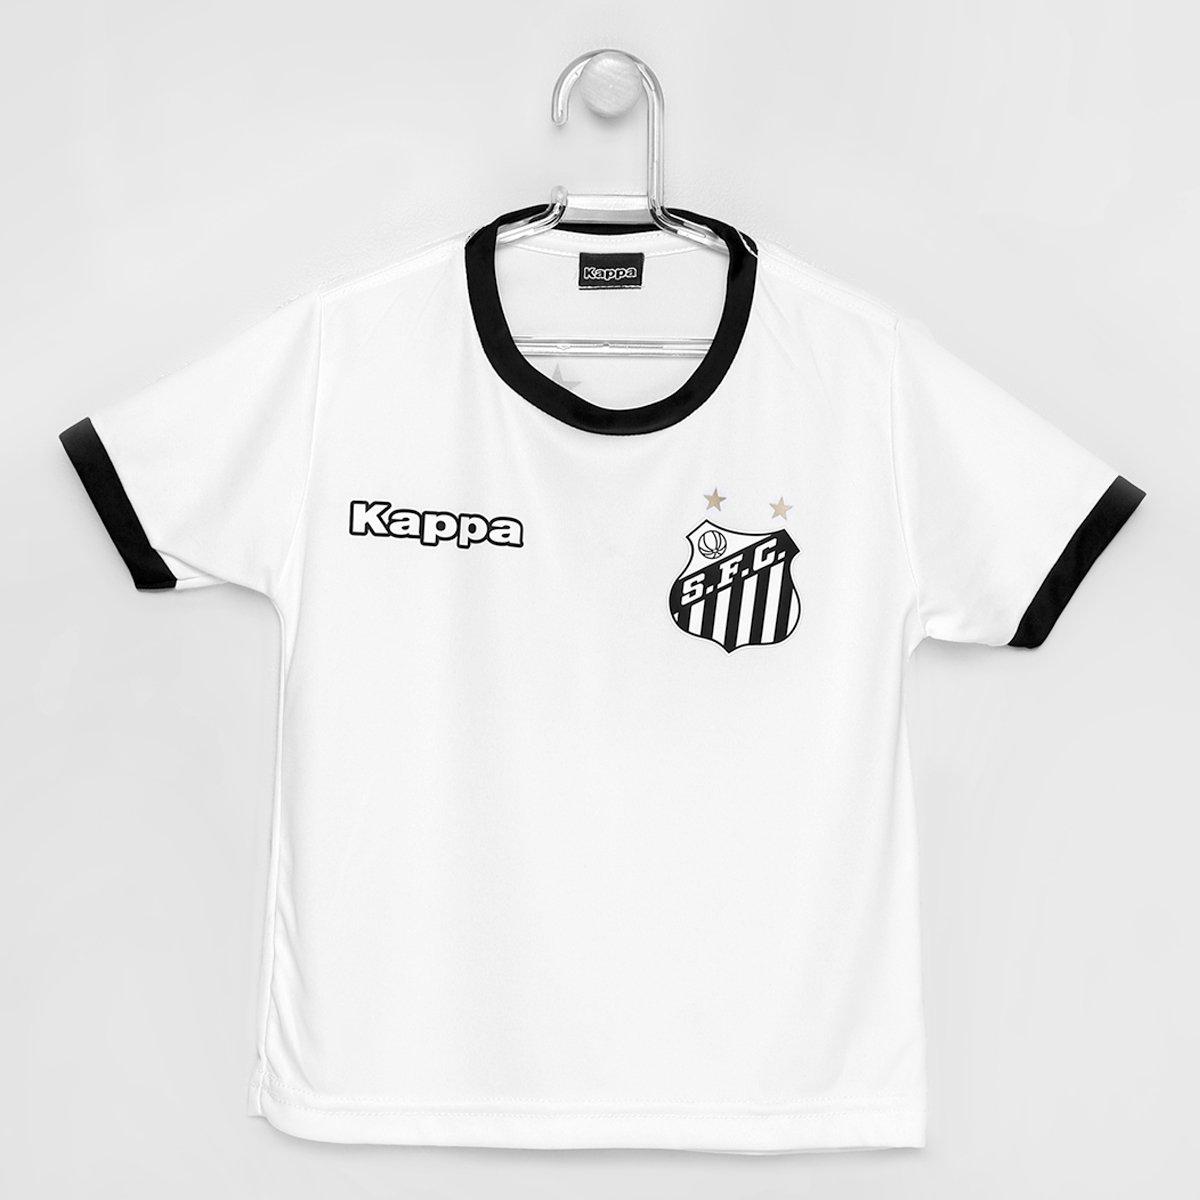 aa162c63bd Camisa Kappa Santos Shield 2016 - Infantil - Compre Agora